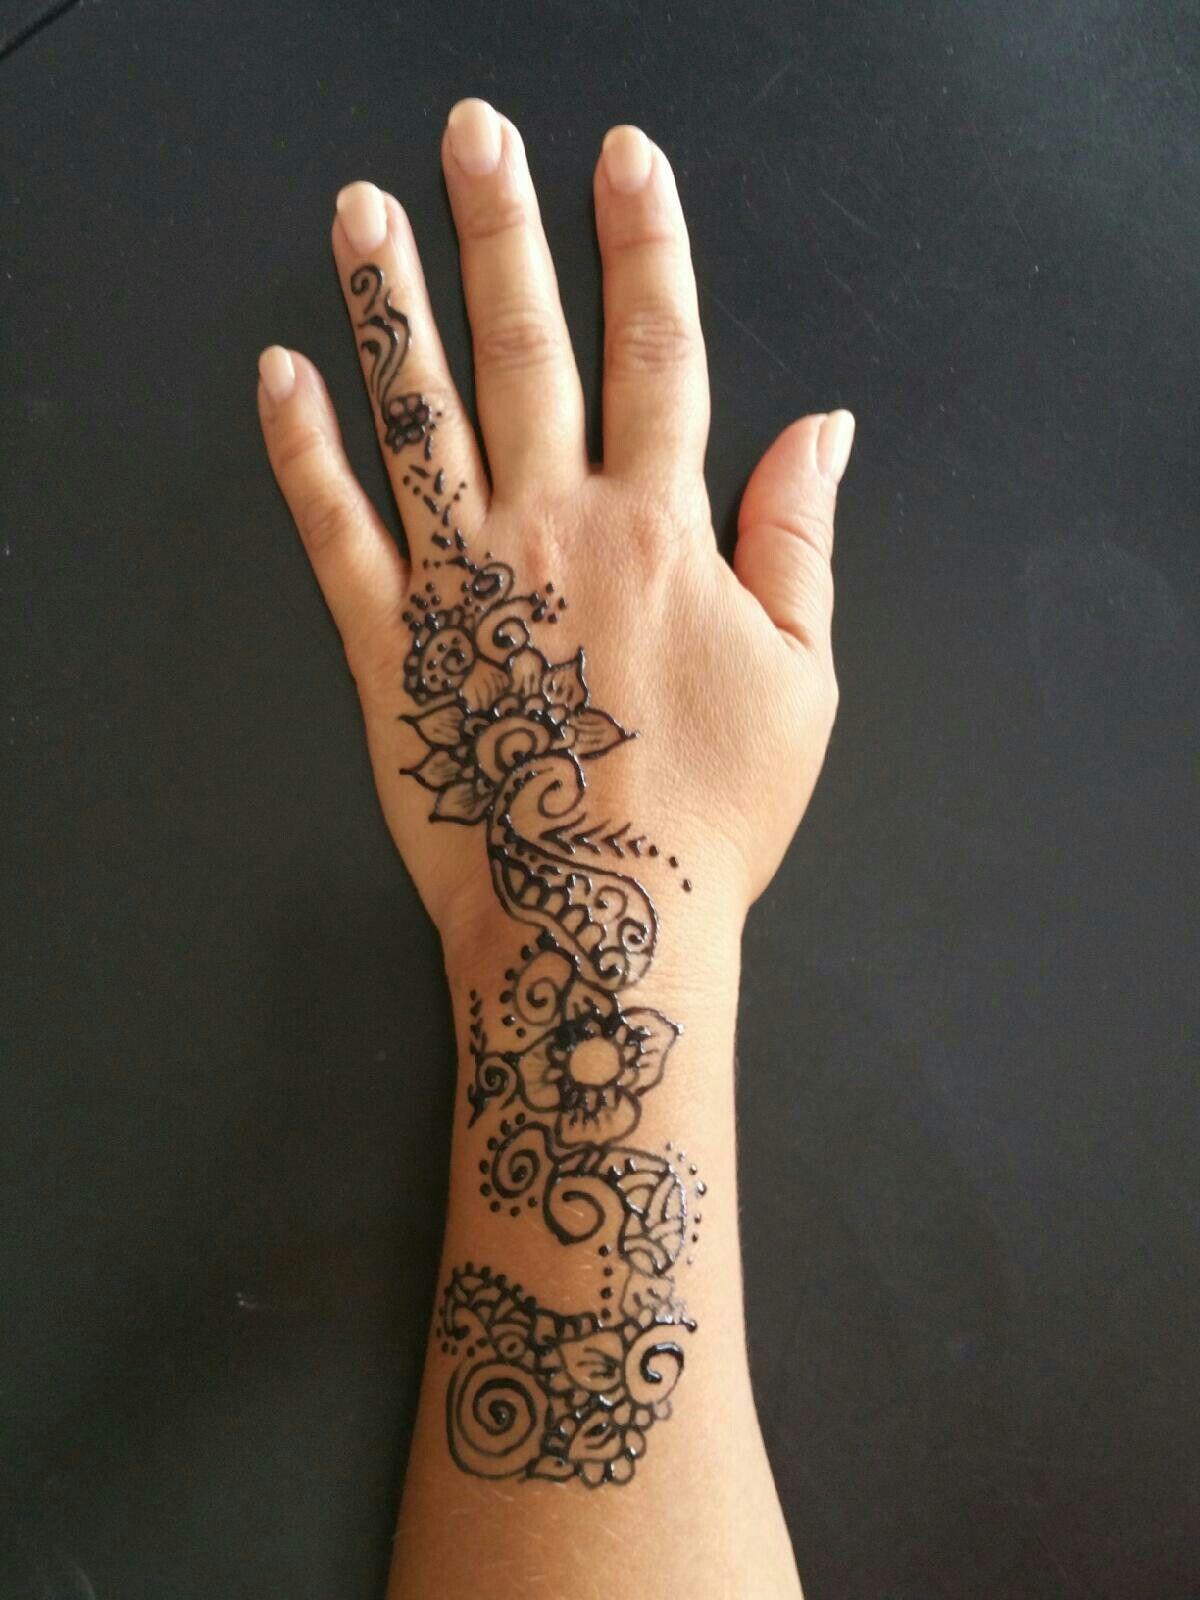 3dad57eab Henna tattoo, nice design.   Tatuajes   Henna, Hand tattoos, Hand henna